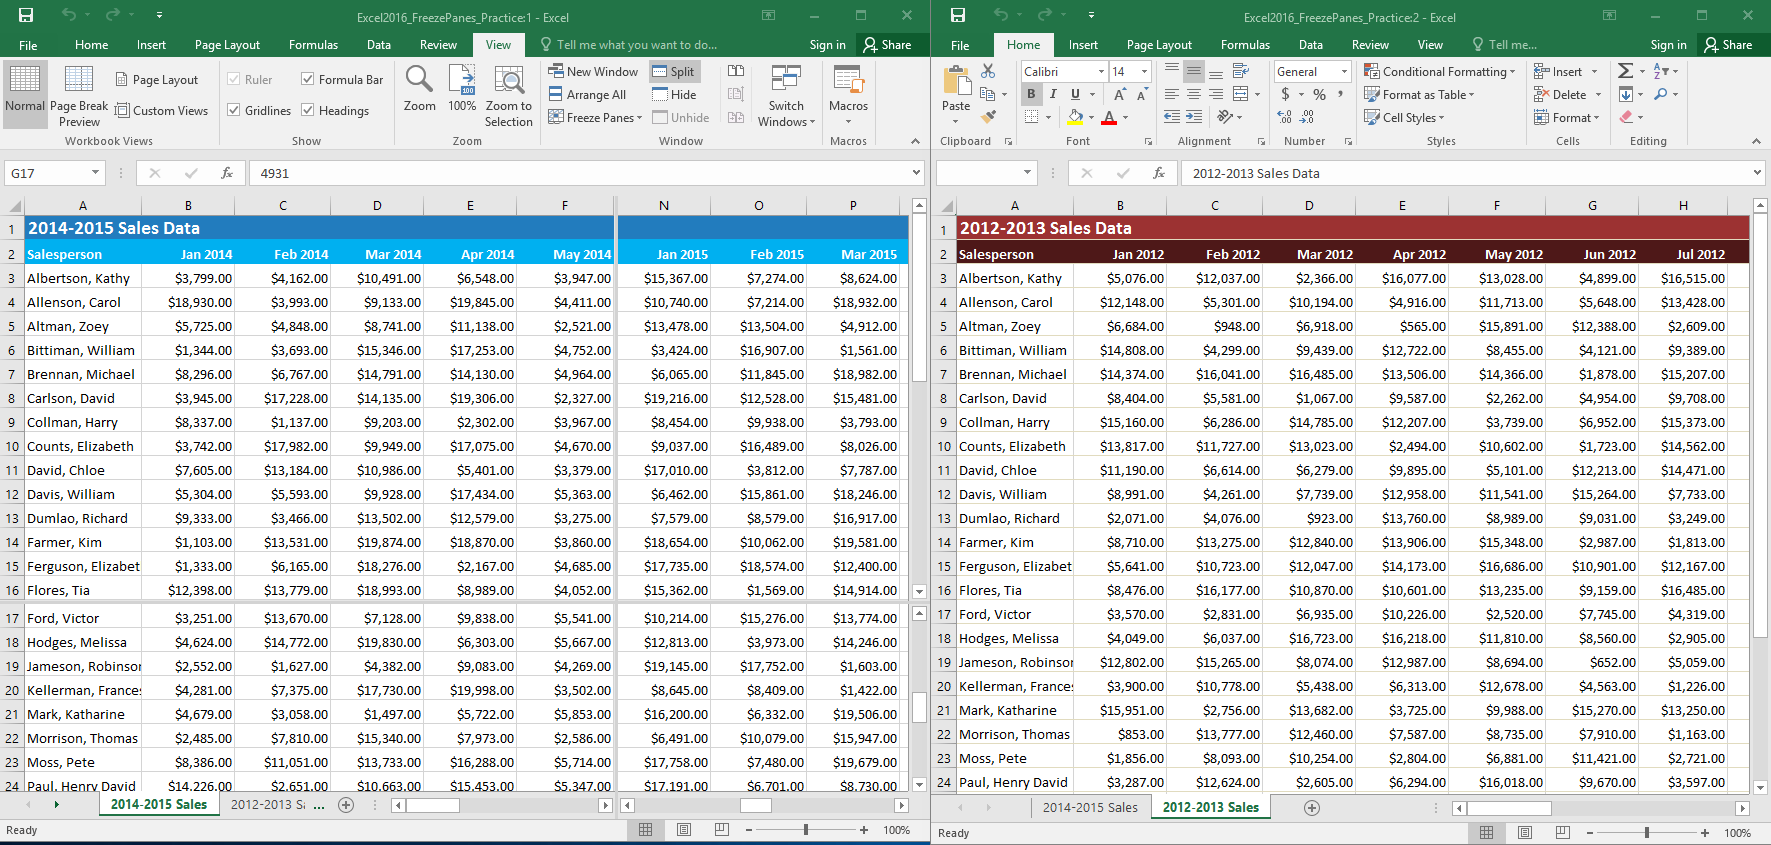 Excel 2016 freezing panes and view options freezing panes challenge ibookread ePUb